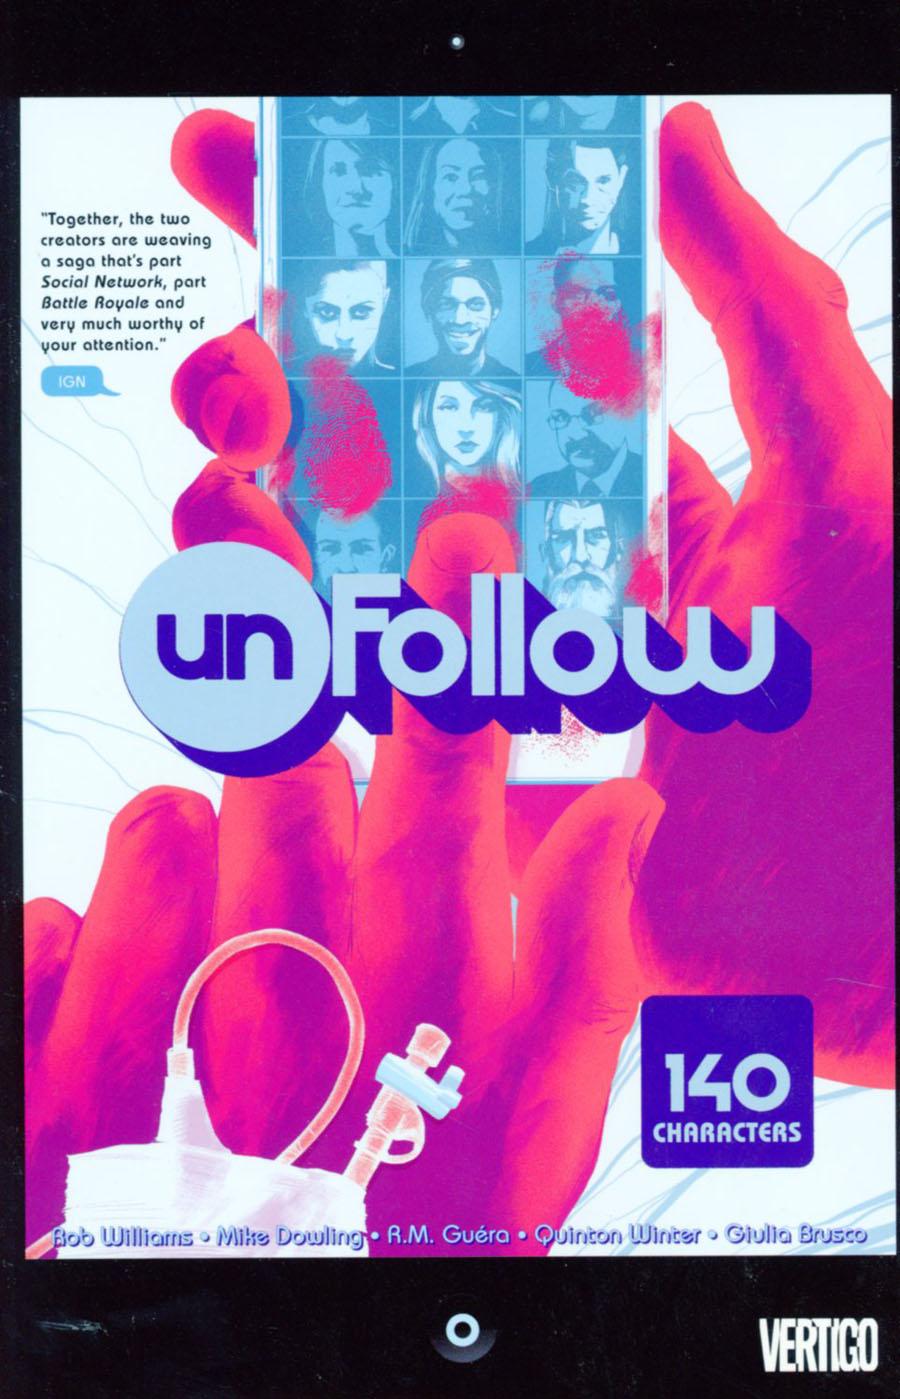 Unfollow Vol 1 140 Characters TP